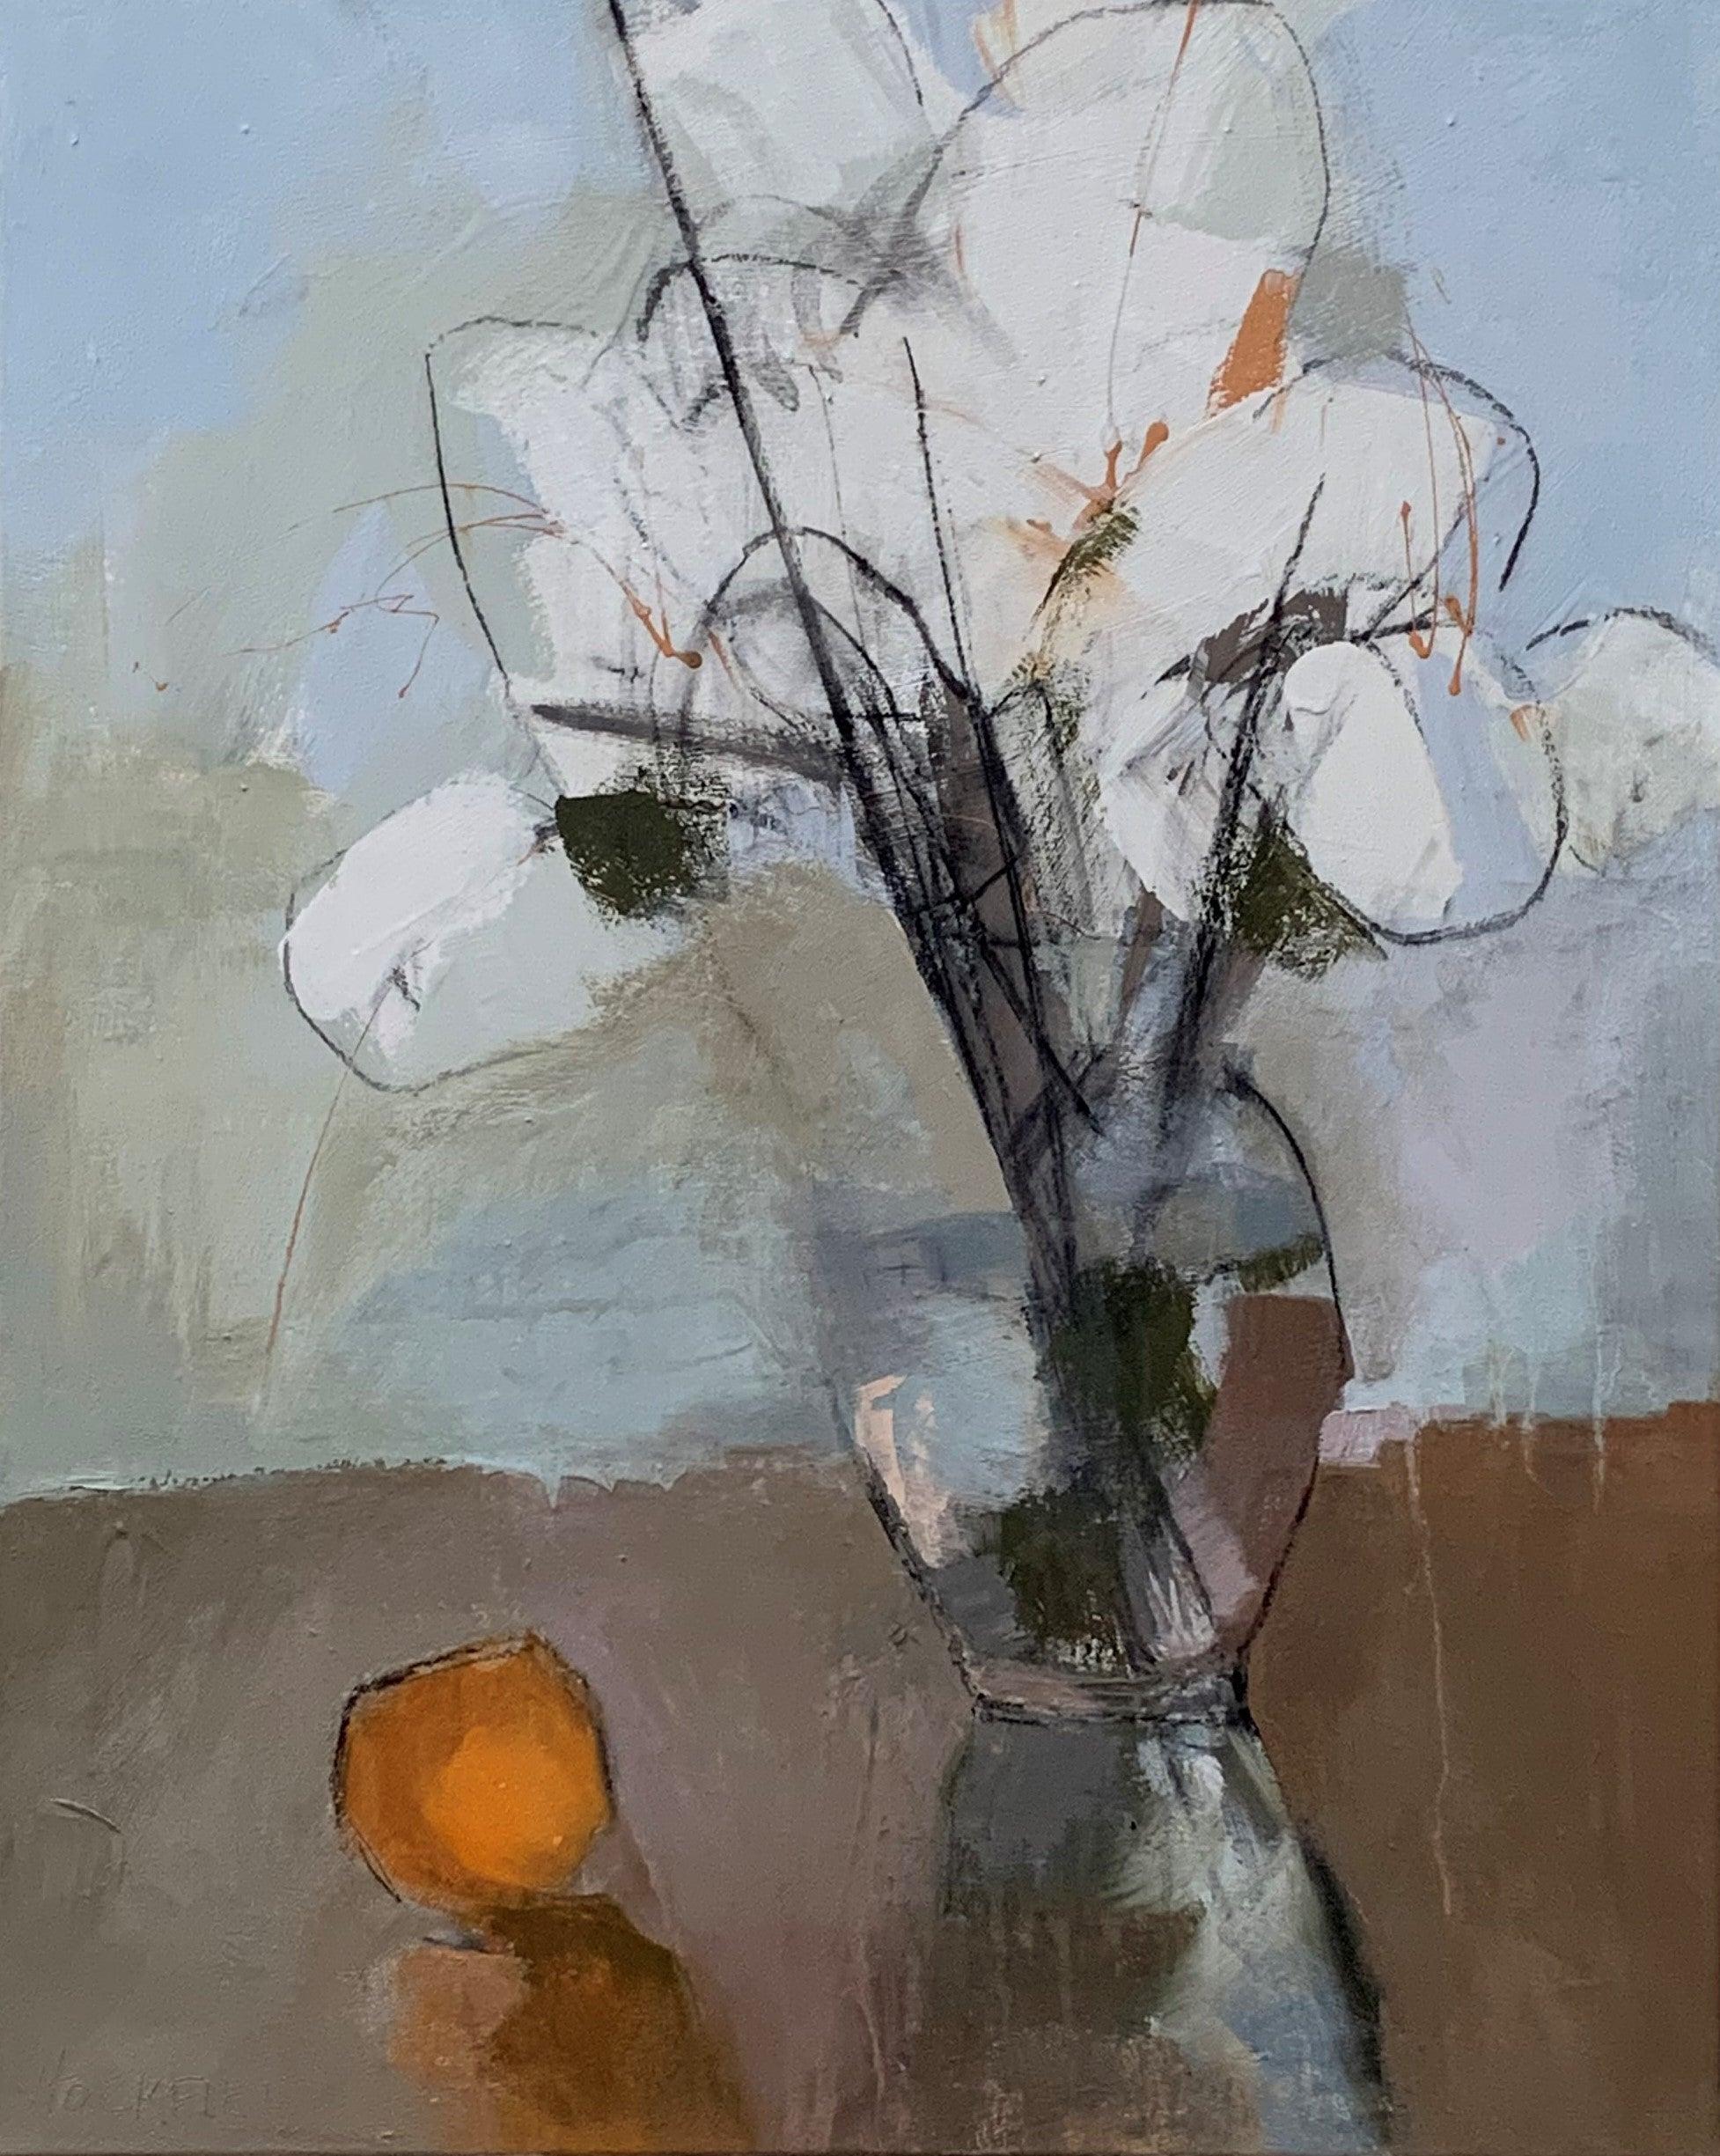 Janie's Hydrangeas by Sharon Hockfield, Contemporary Floral Still Life